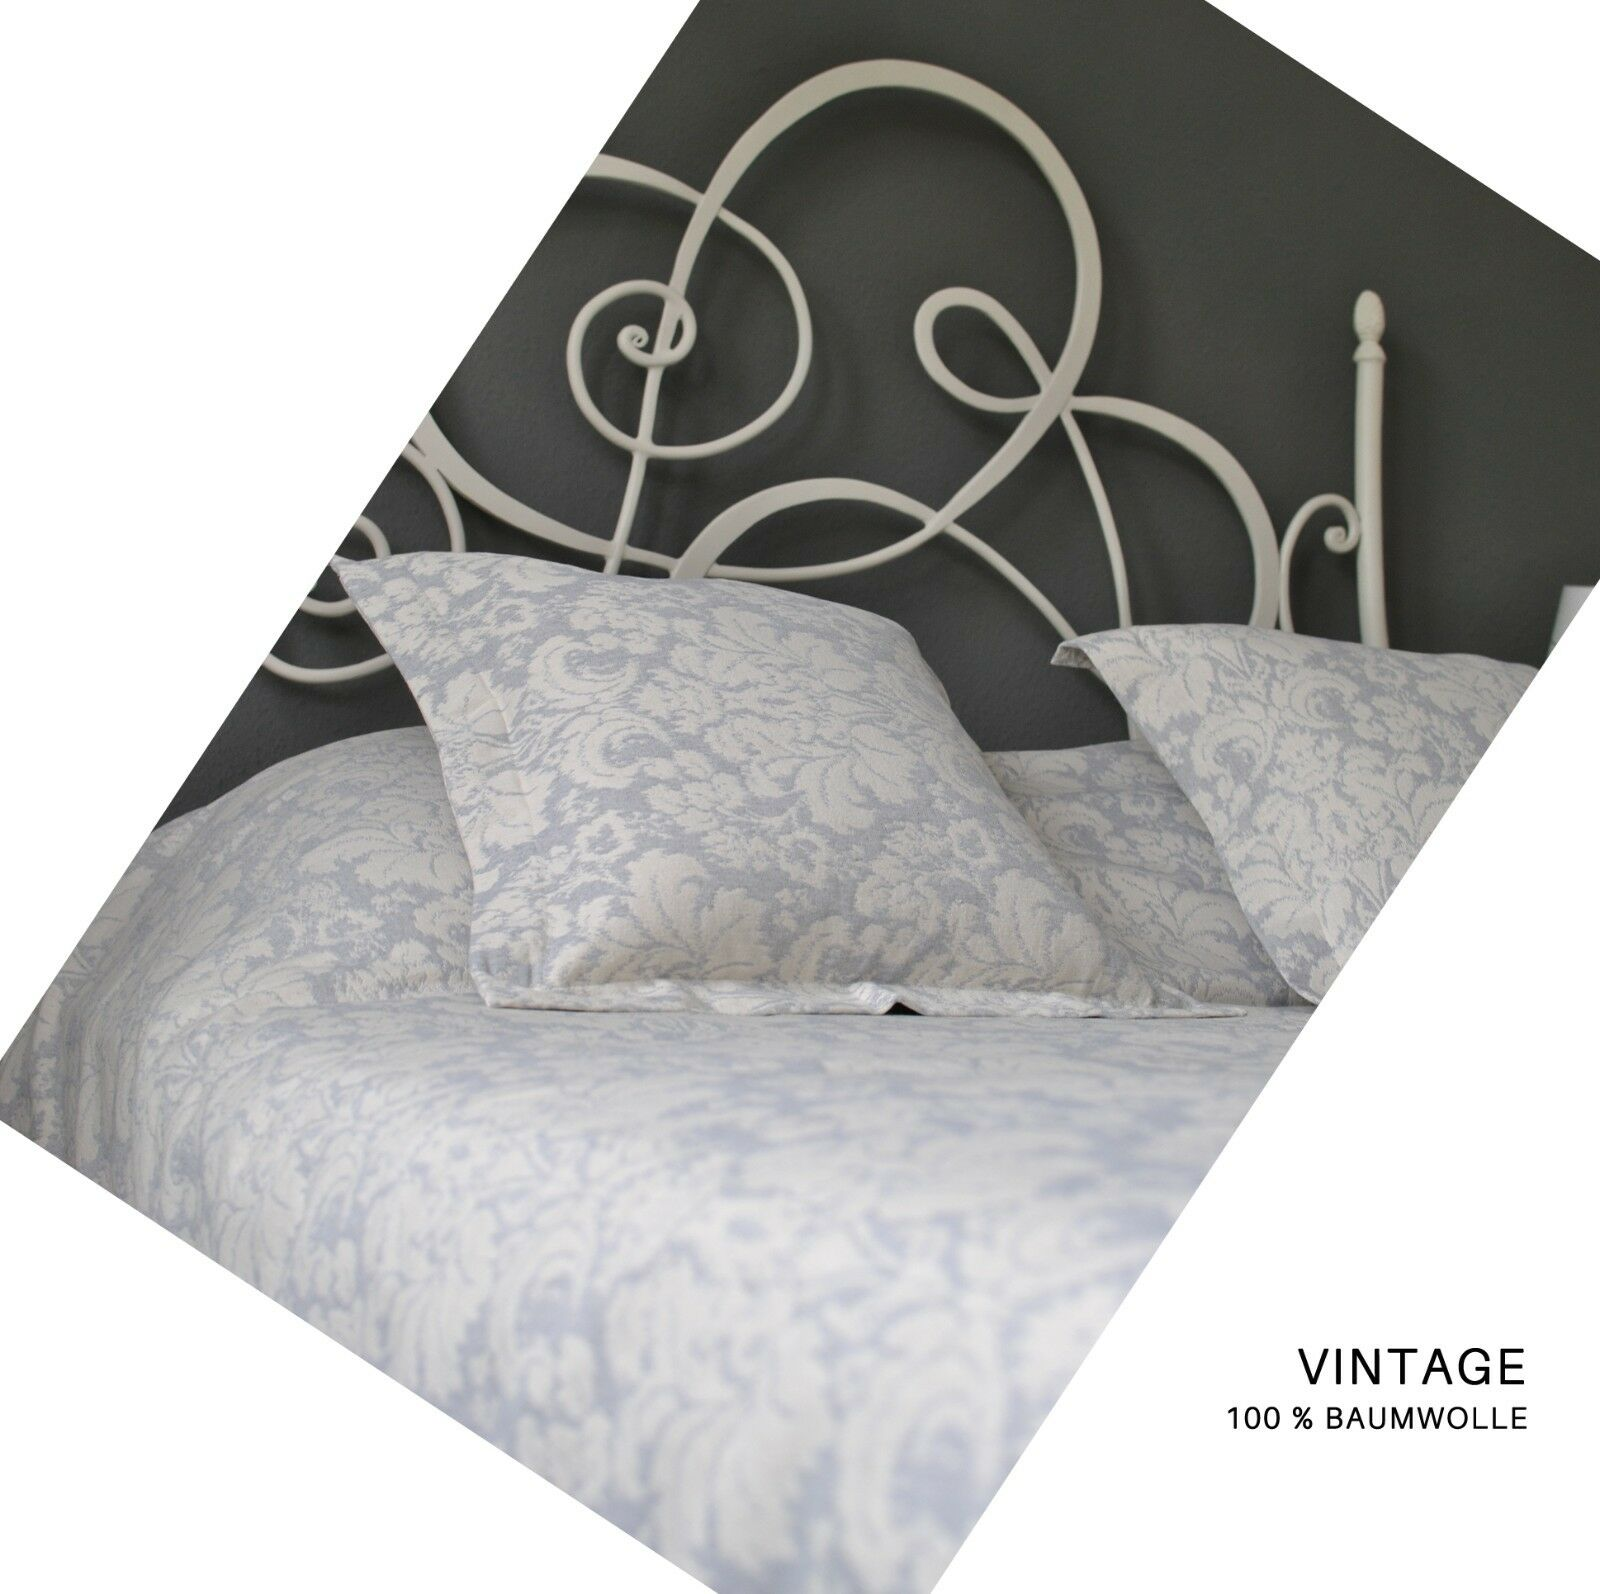 Vintage bettüberwürf Bedspread Grey-Cream *** NEW ***